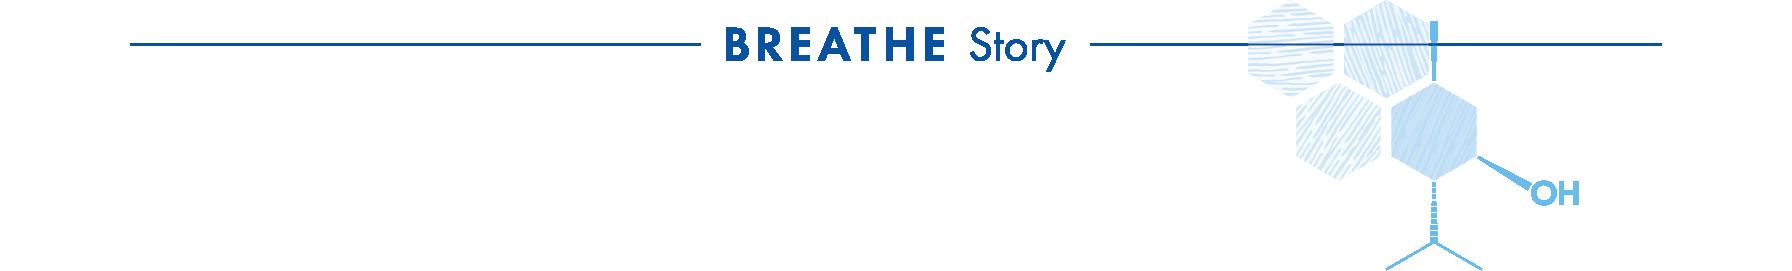 breathe story ブリーズストーリー